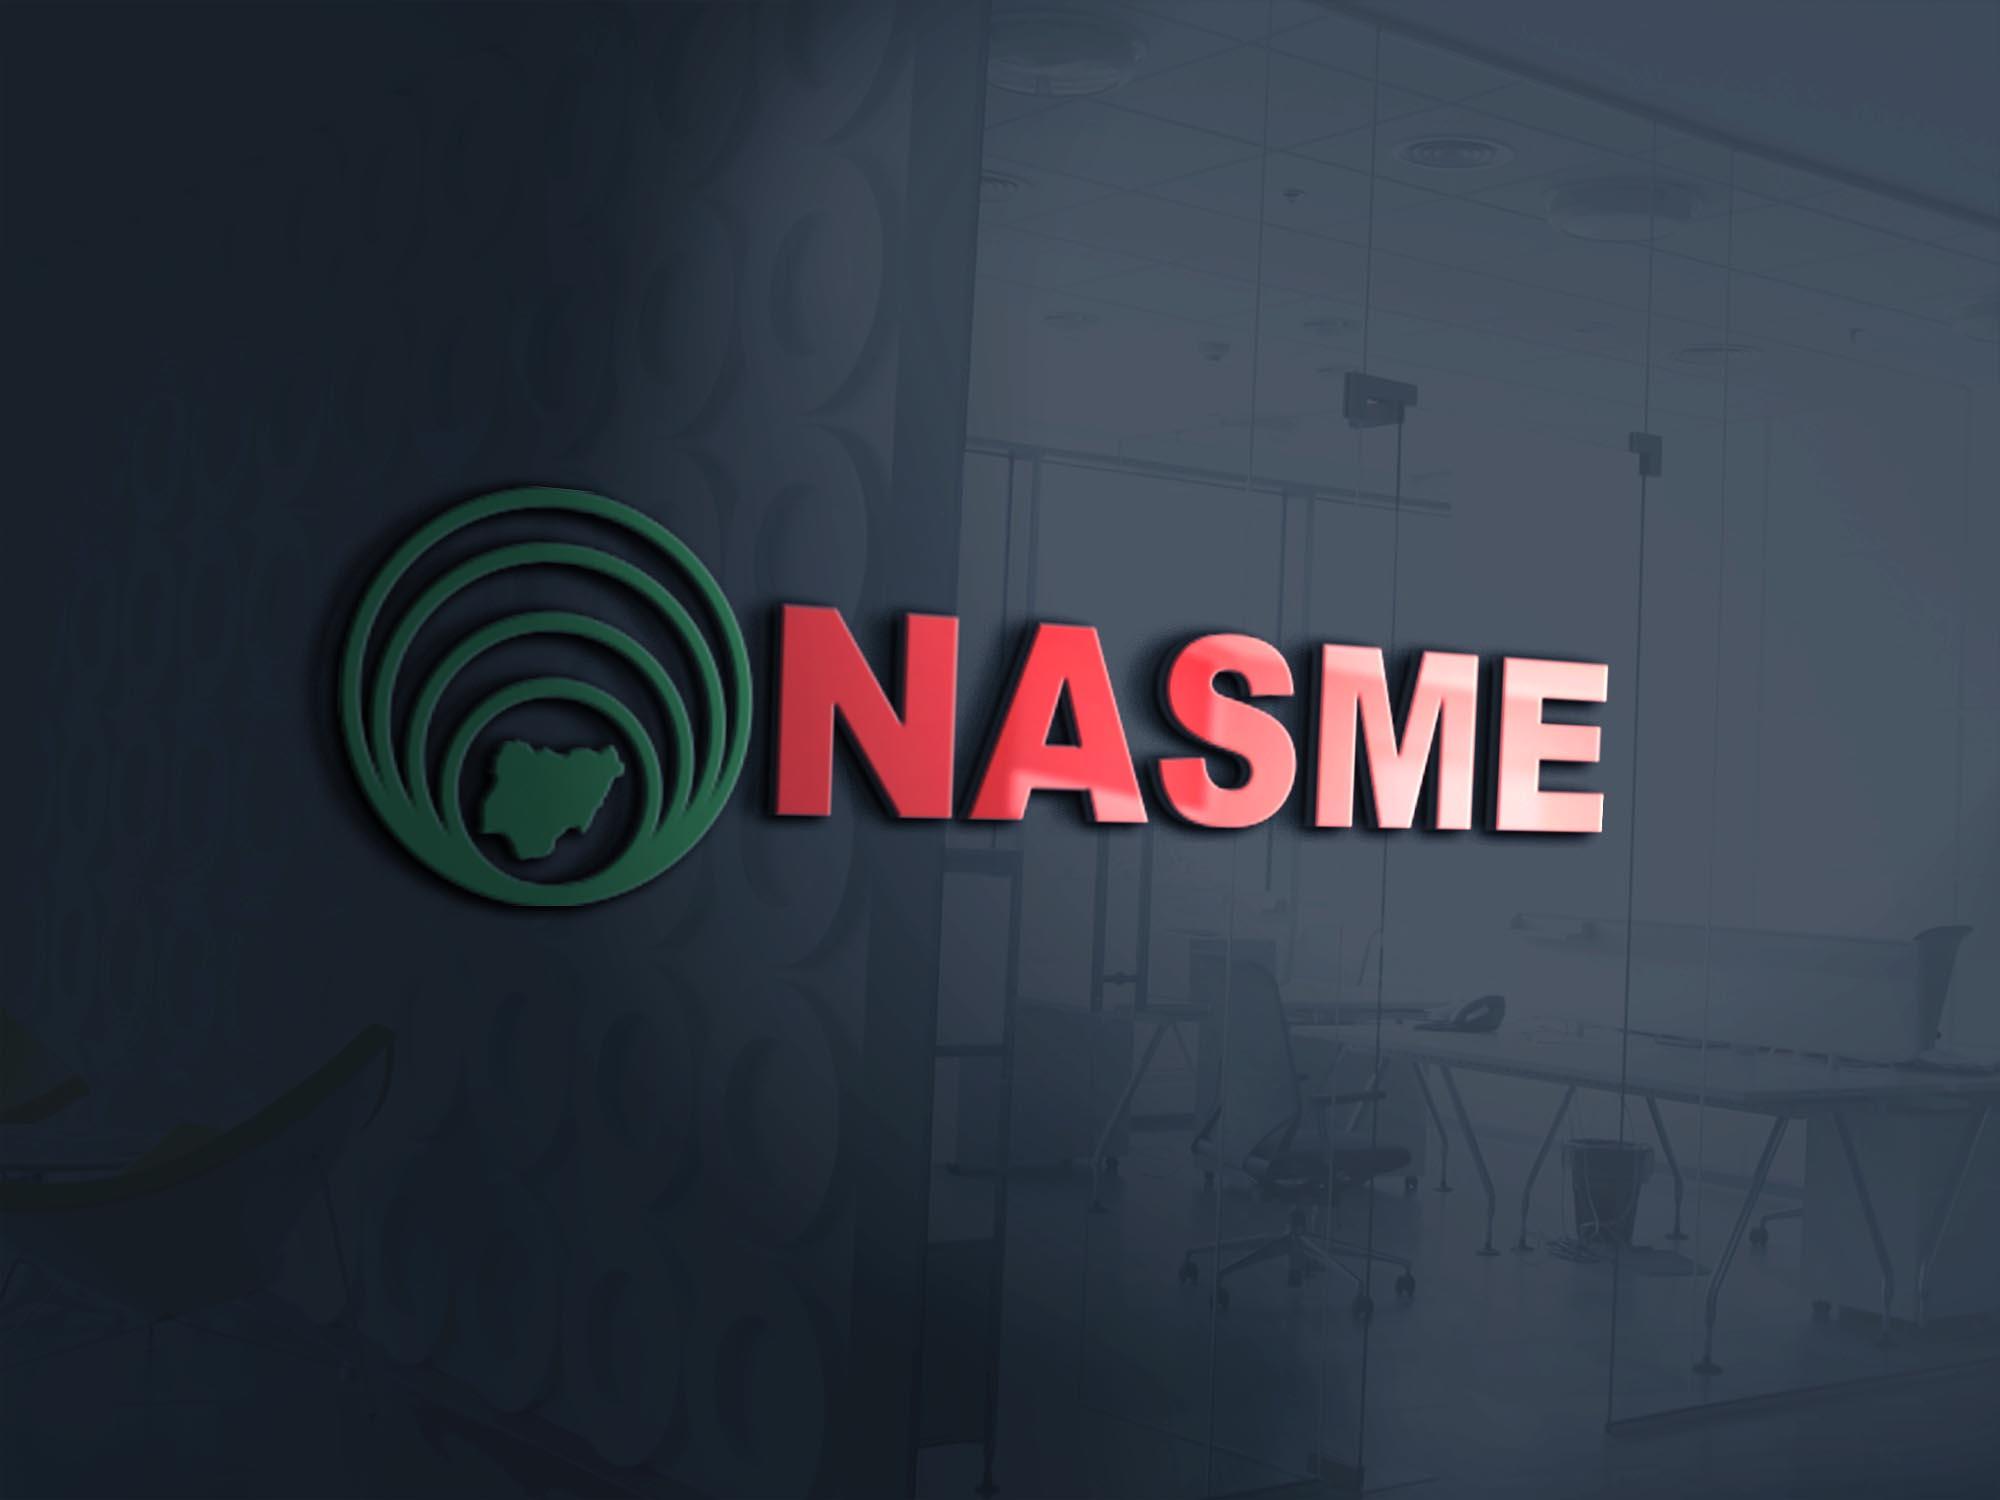 NASME laments N30m loss to Owerri summit shift